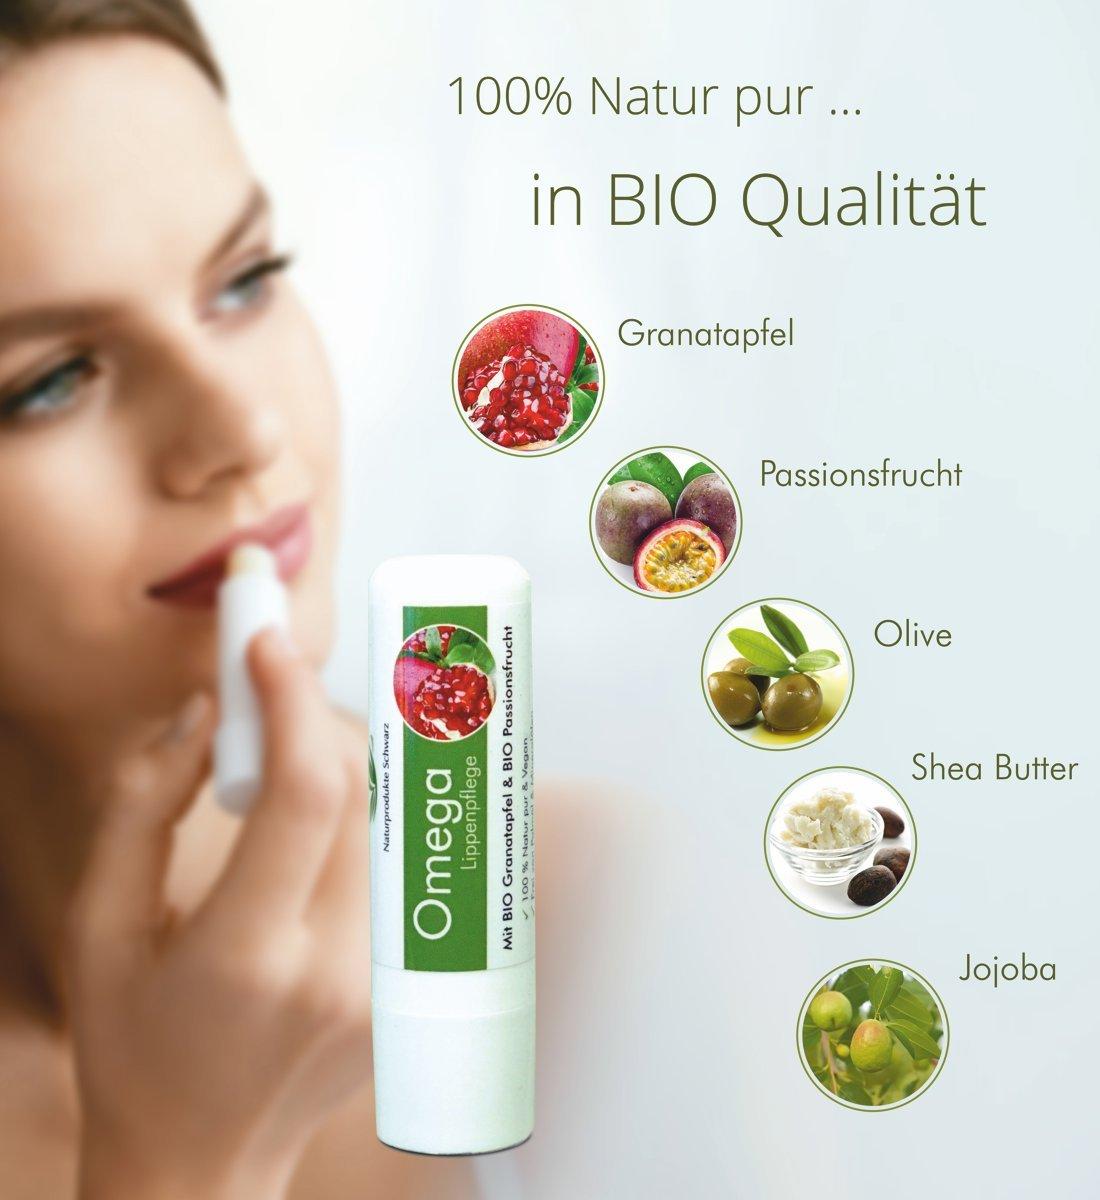 a950b9674466ee Naturprodukte Schwarz - Omega Lippenpflege mit BIO Granatapfel   BIO  Passionsfrucht - Vegan